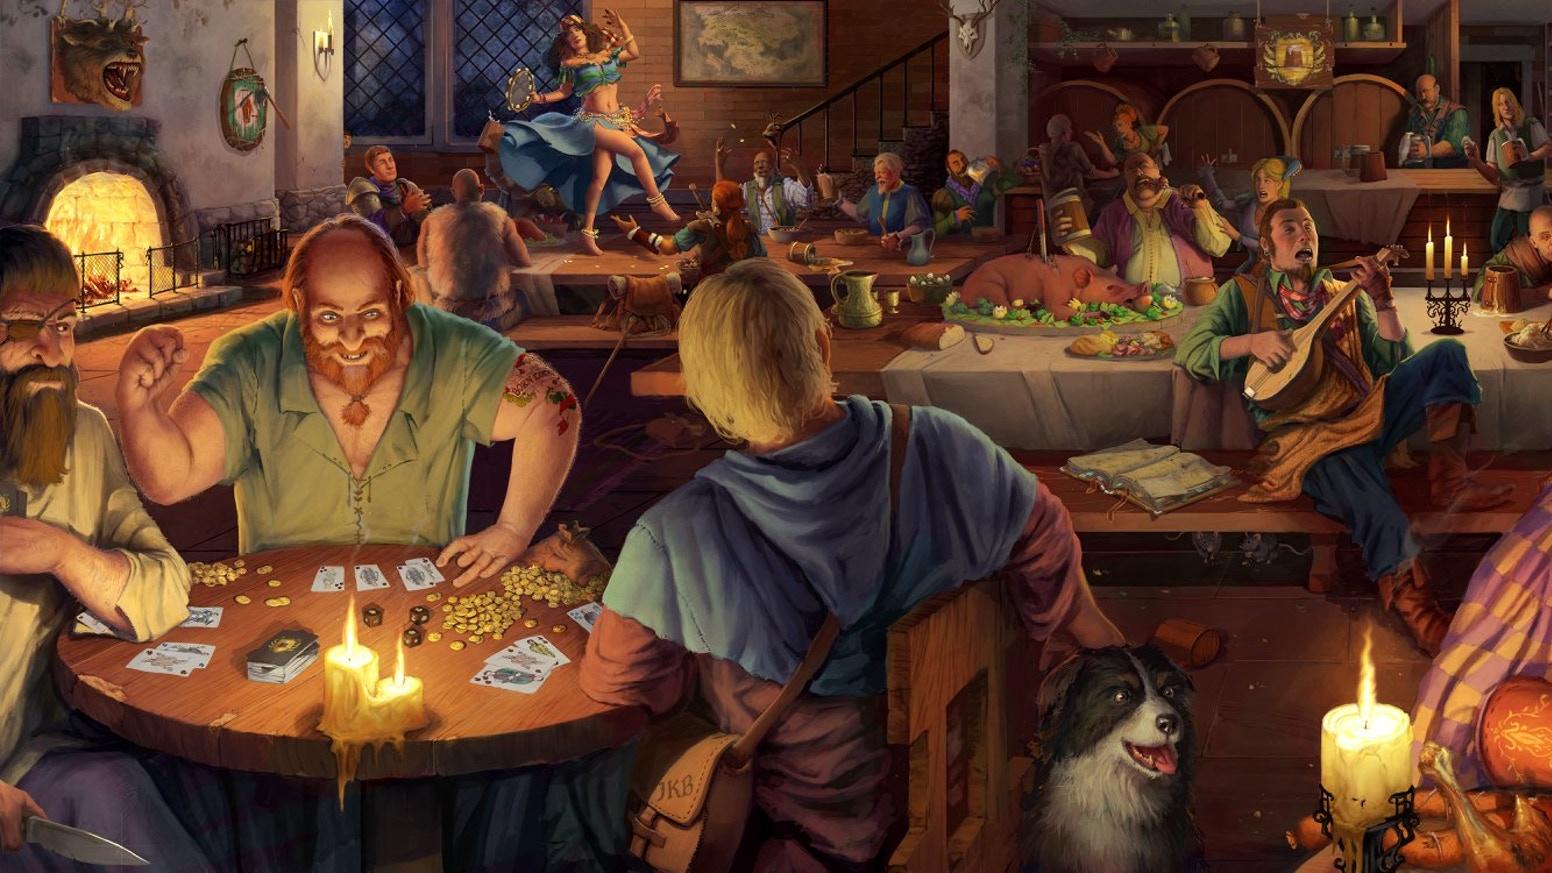 Fantasy tavern simulator Crossroads Inn will release in